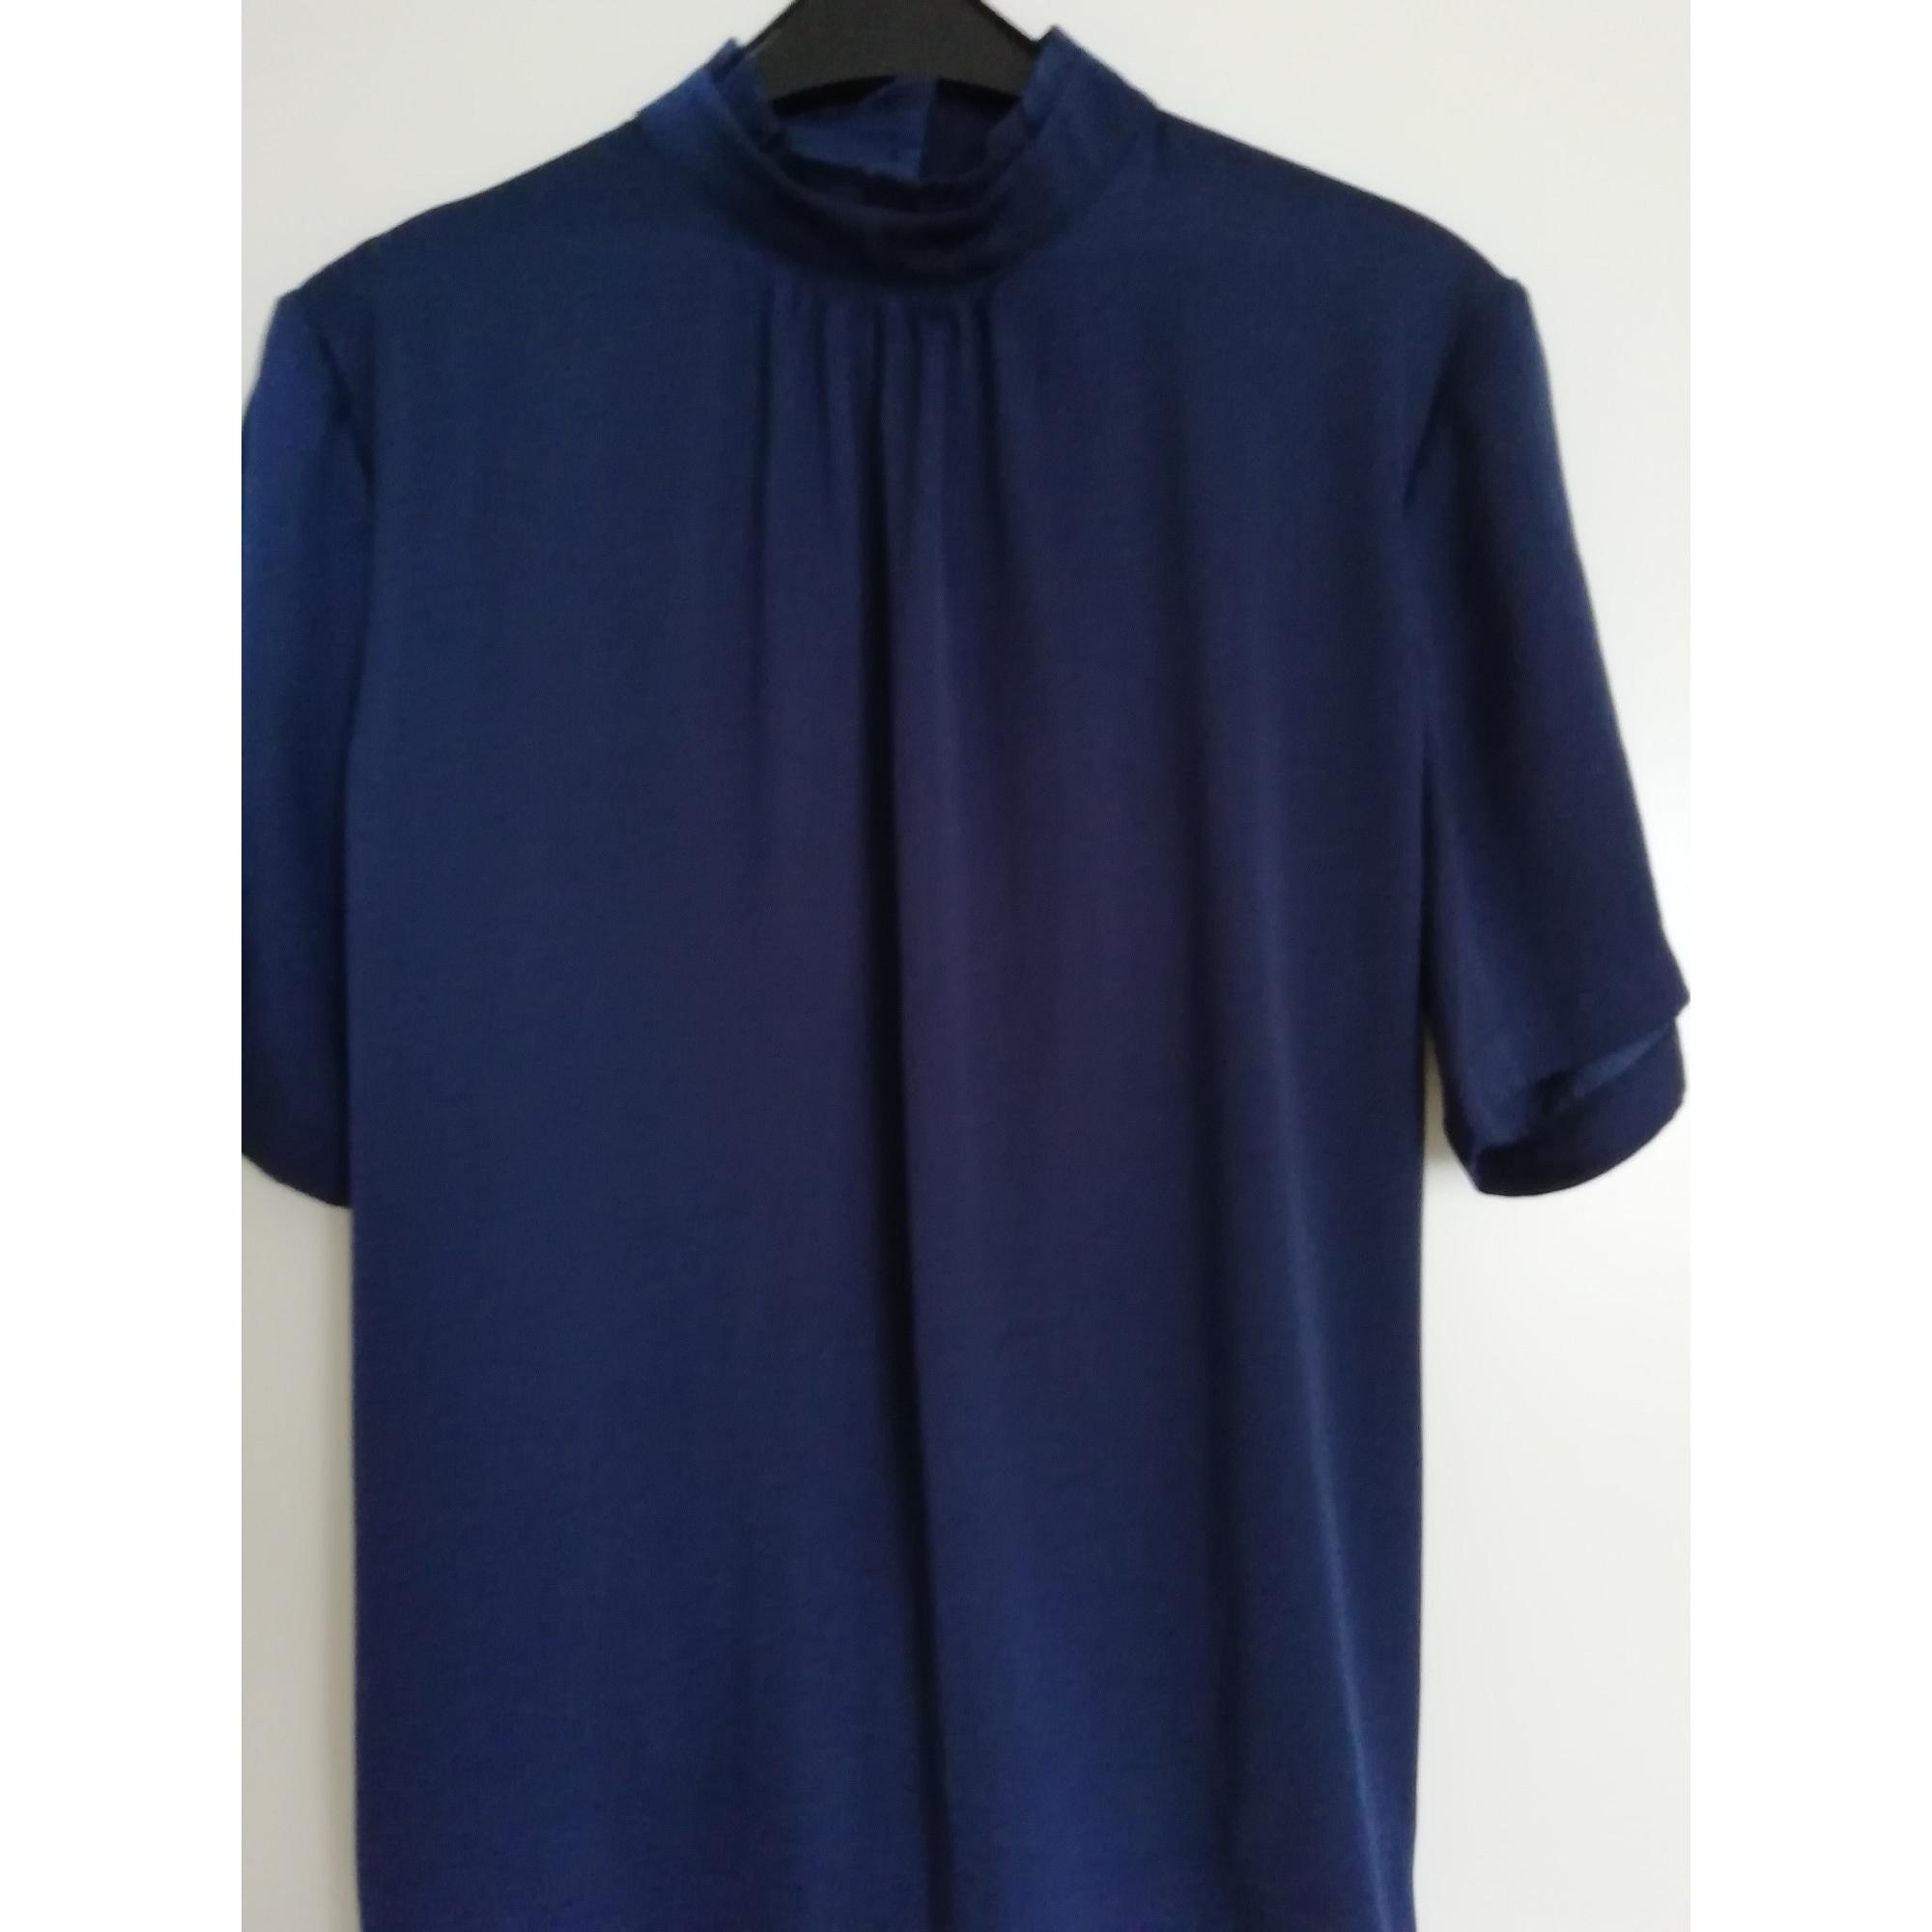 Blouse MODSTRÖM Bleu, bleu marine, bleu turquoise